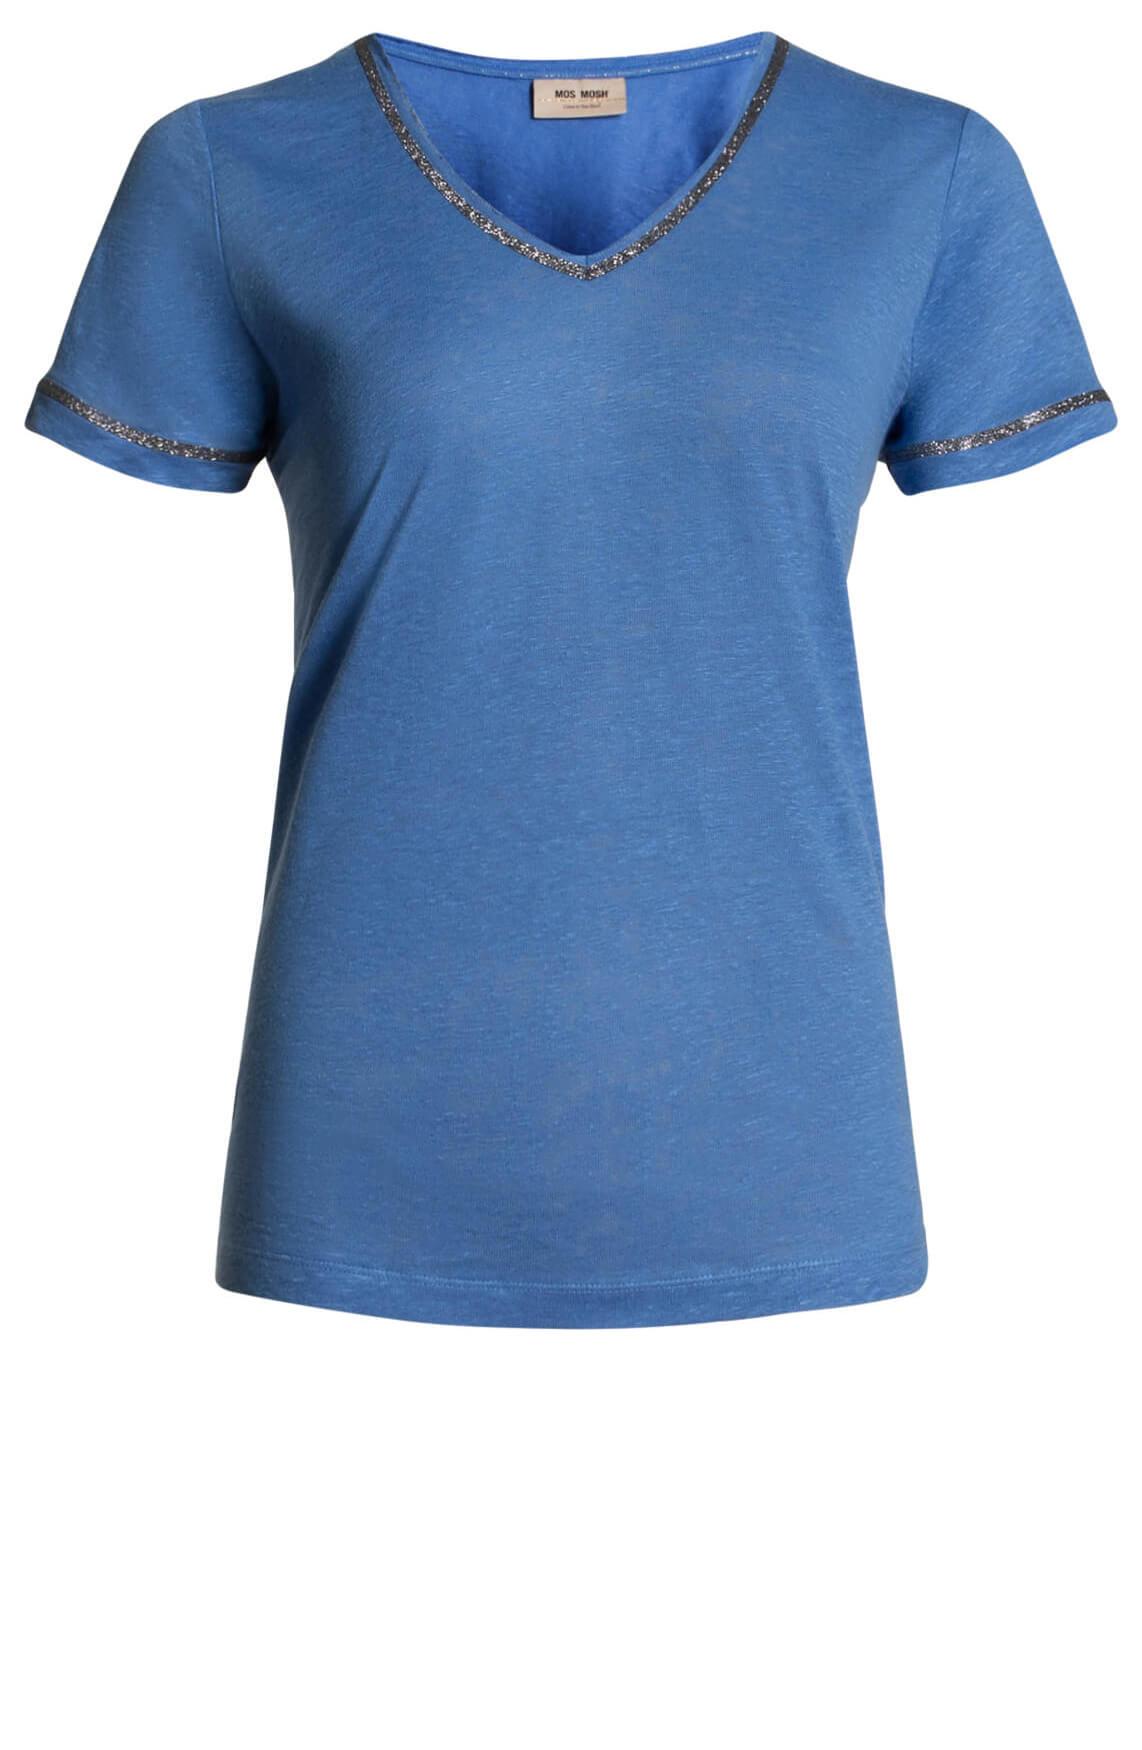 Mos Mosh Dames Gina shirt Blauw